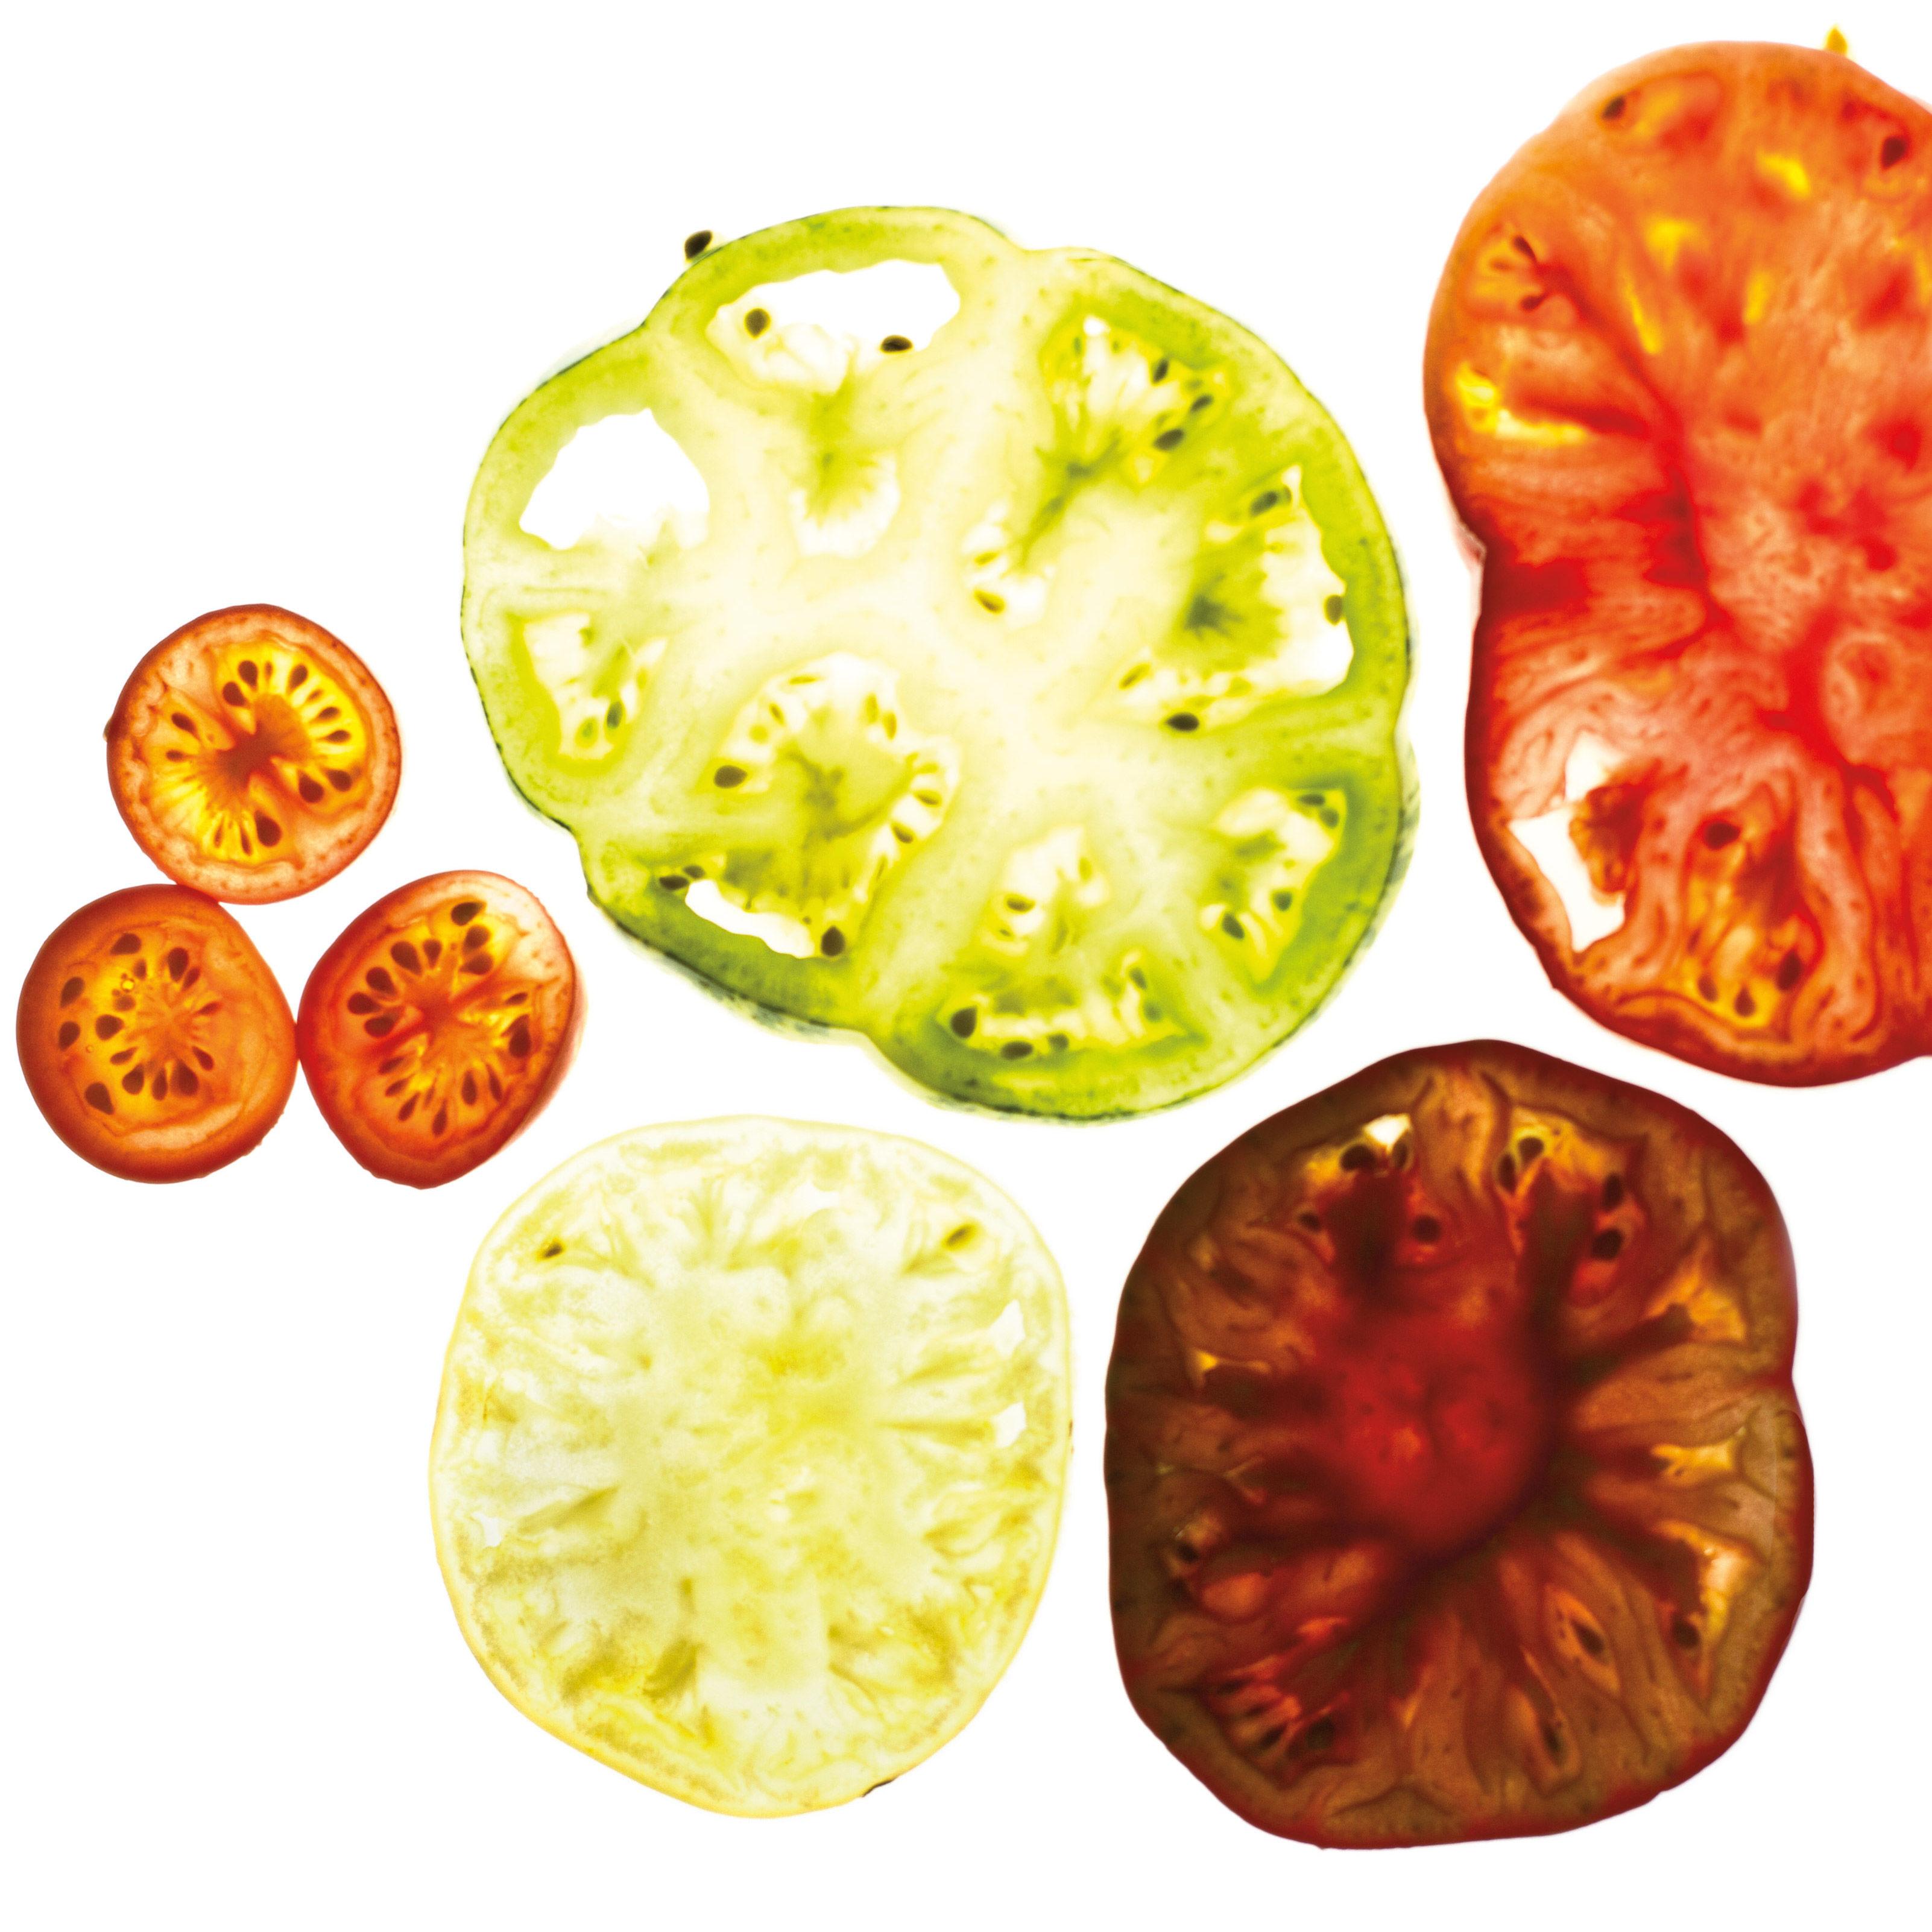 0715 tomatoes2 jw ytwmev